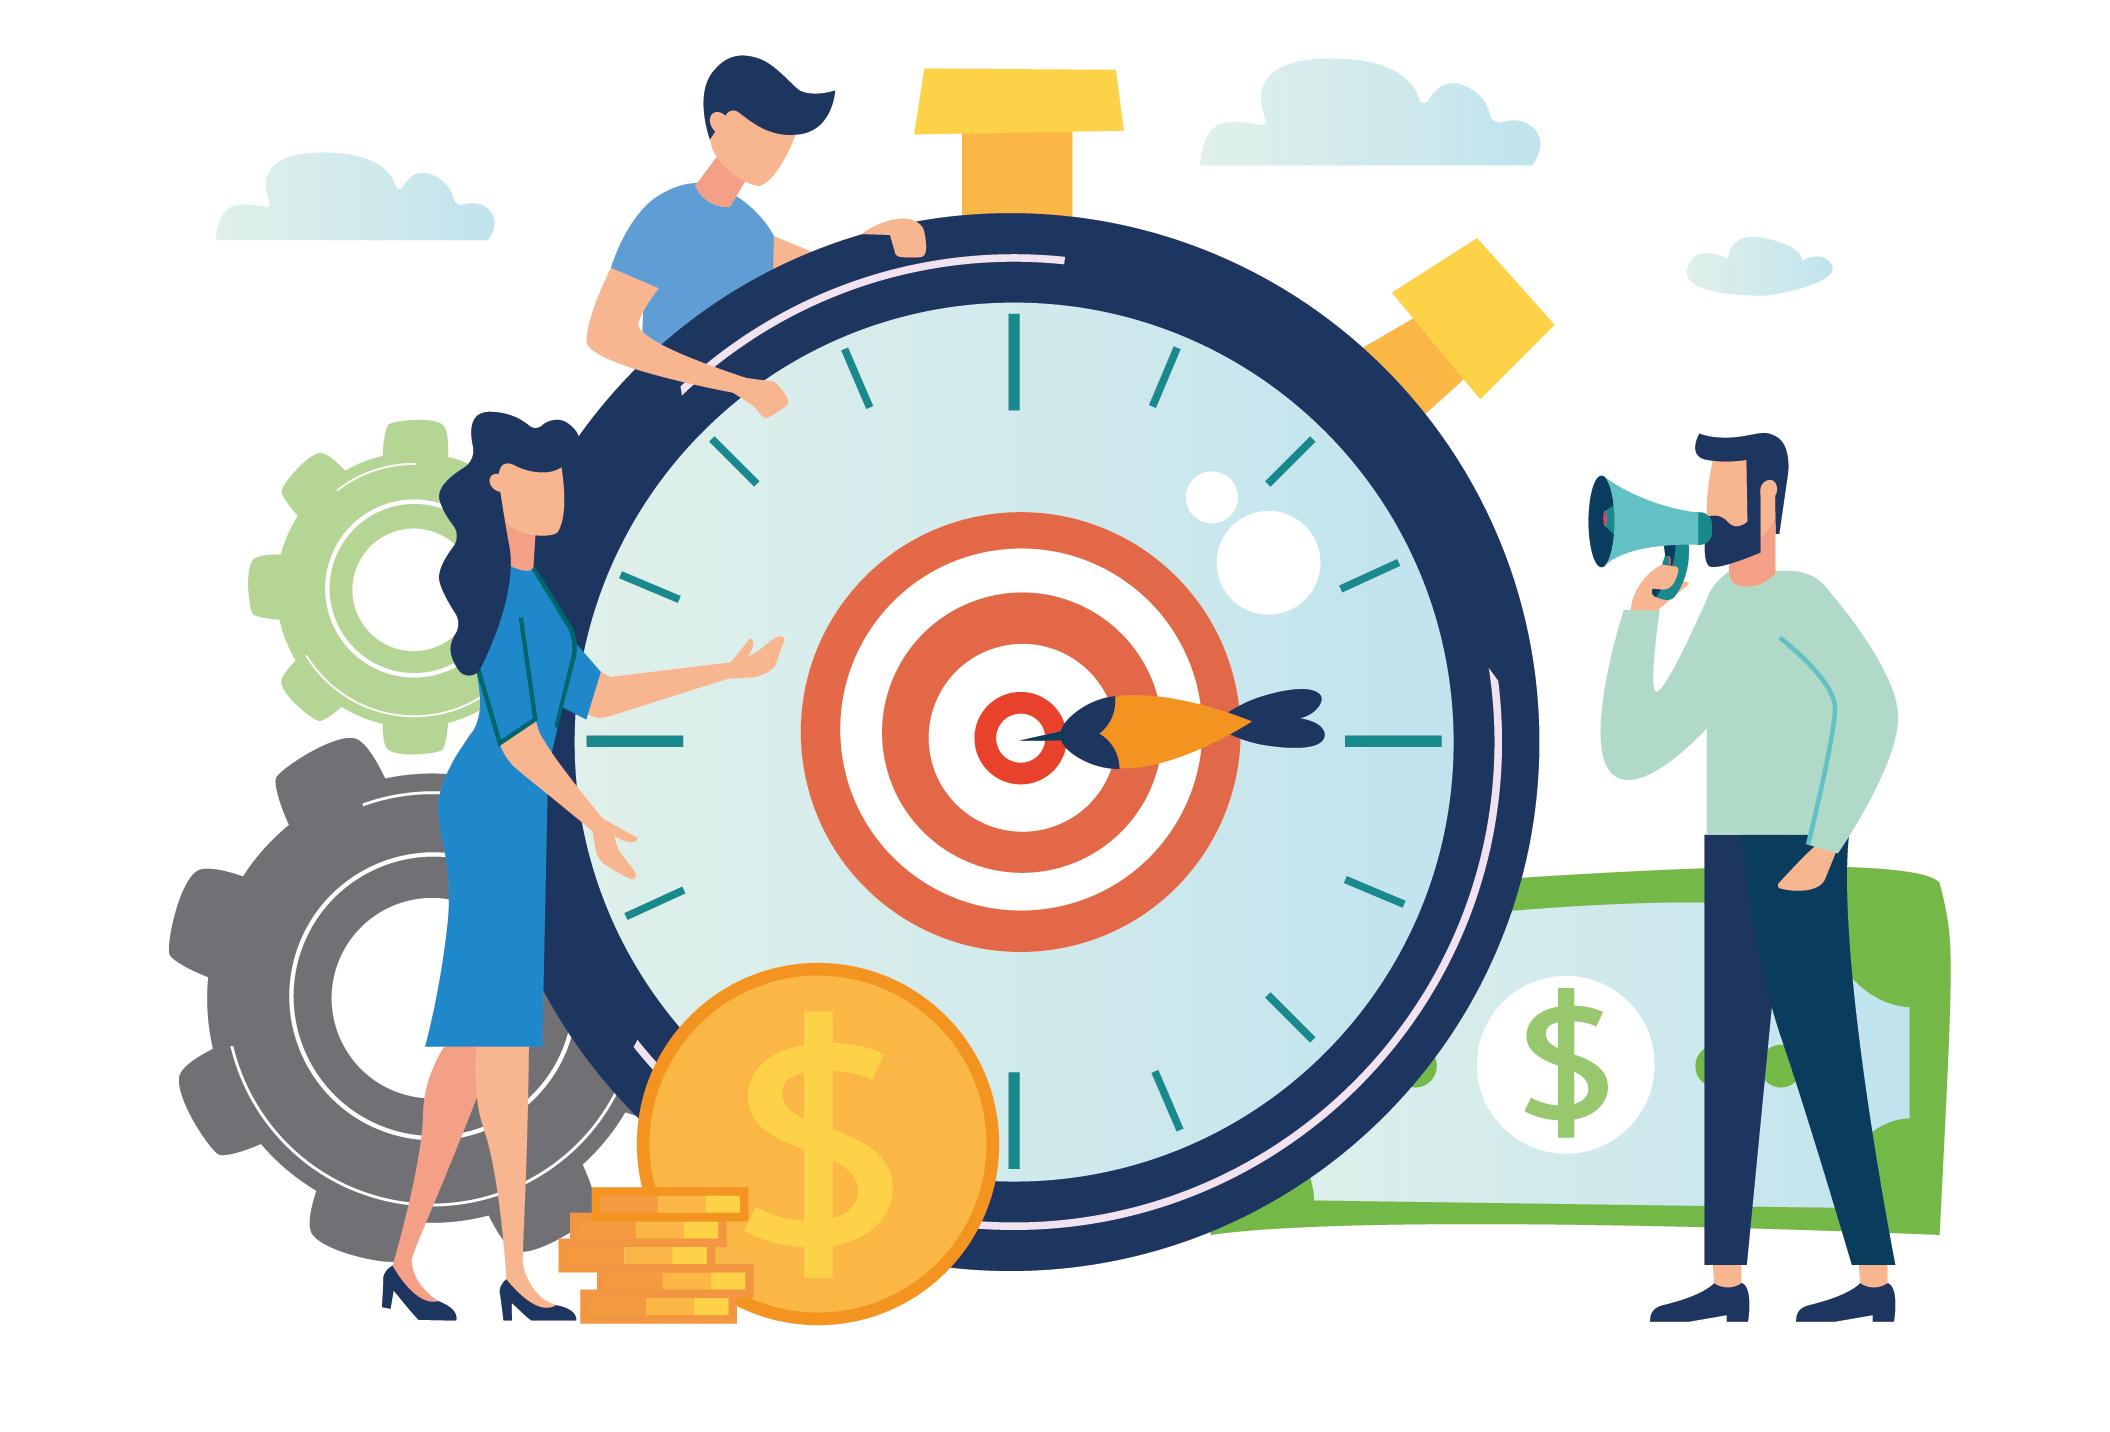 blog image - themed target clock people